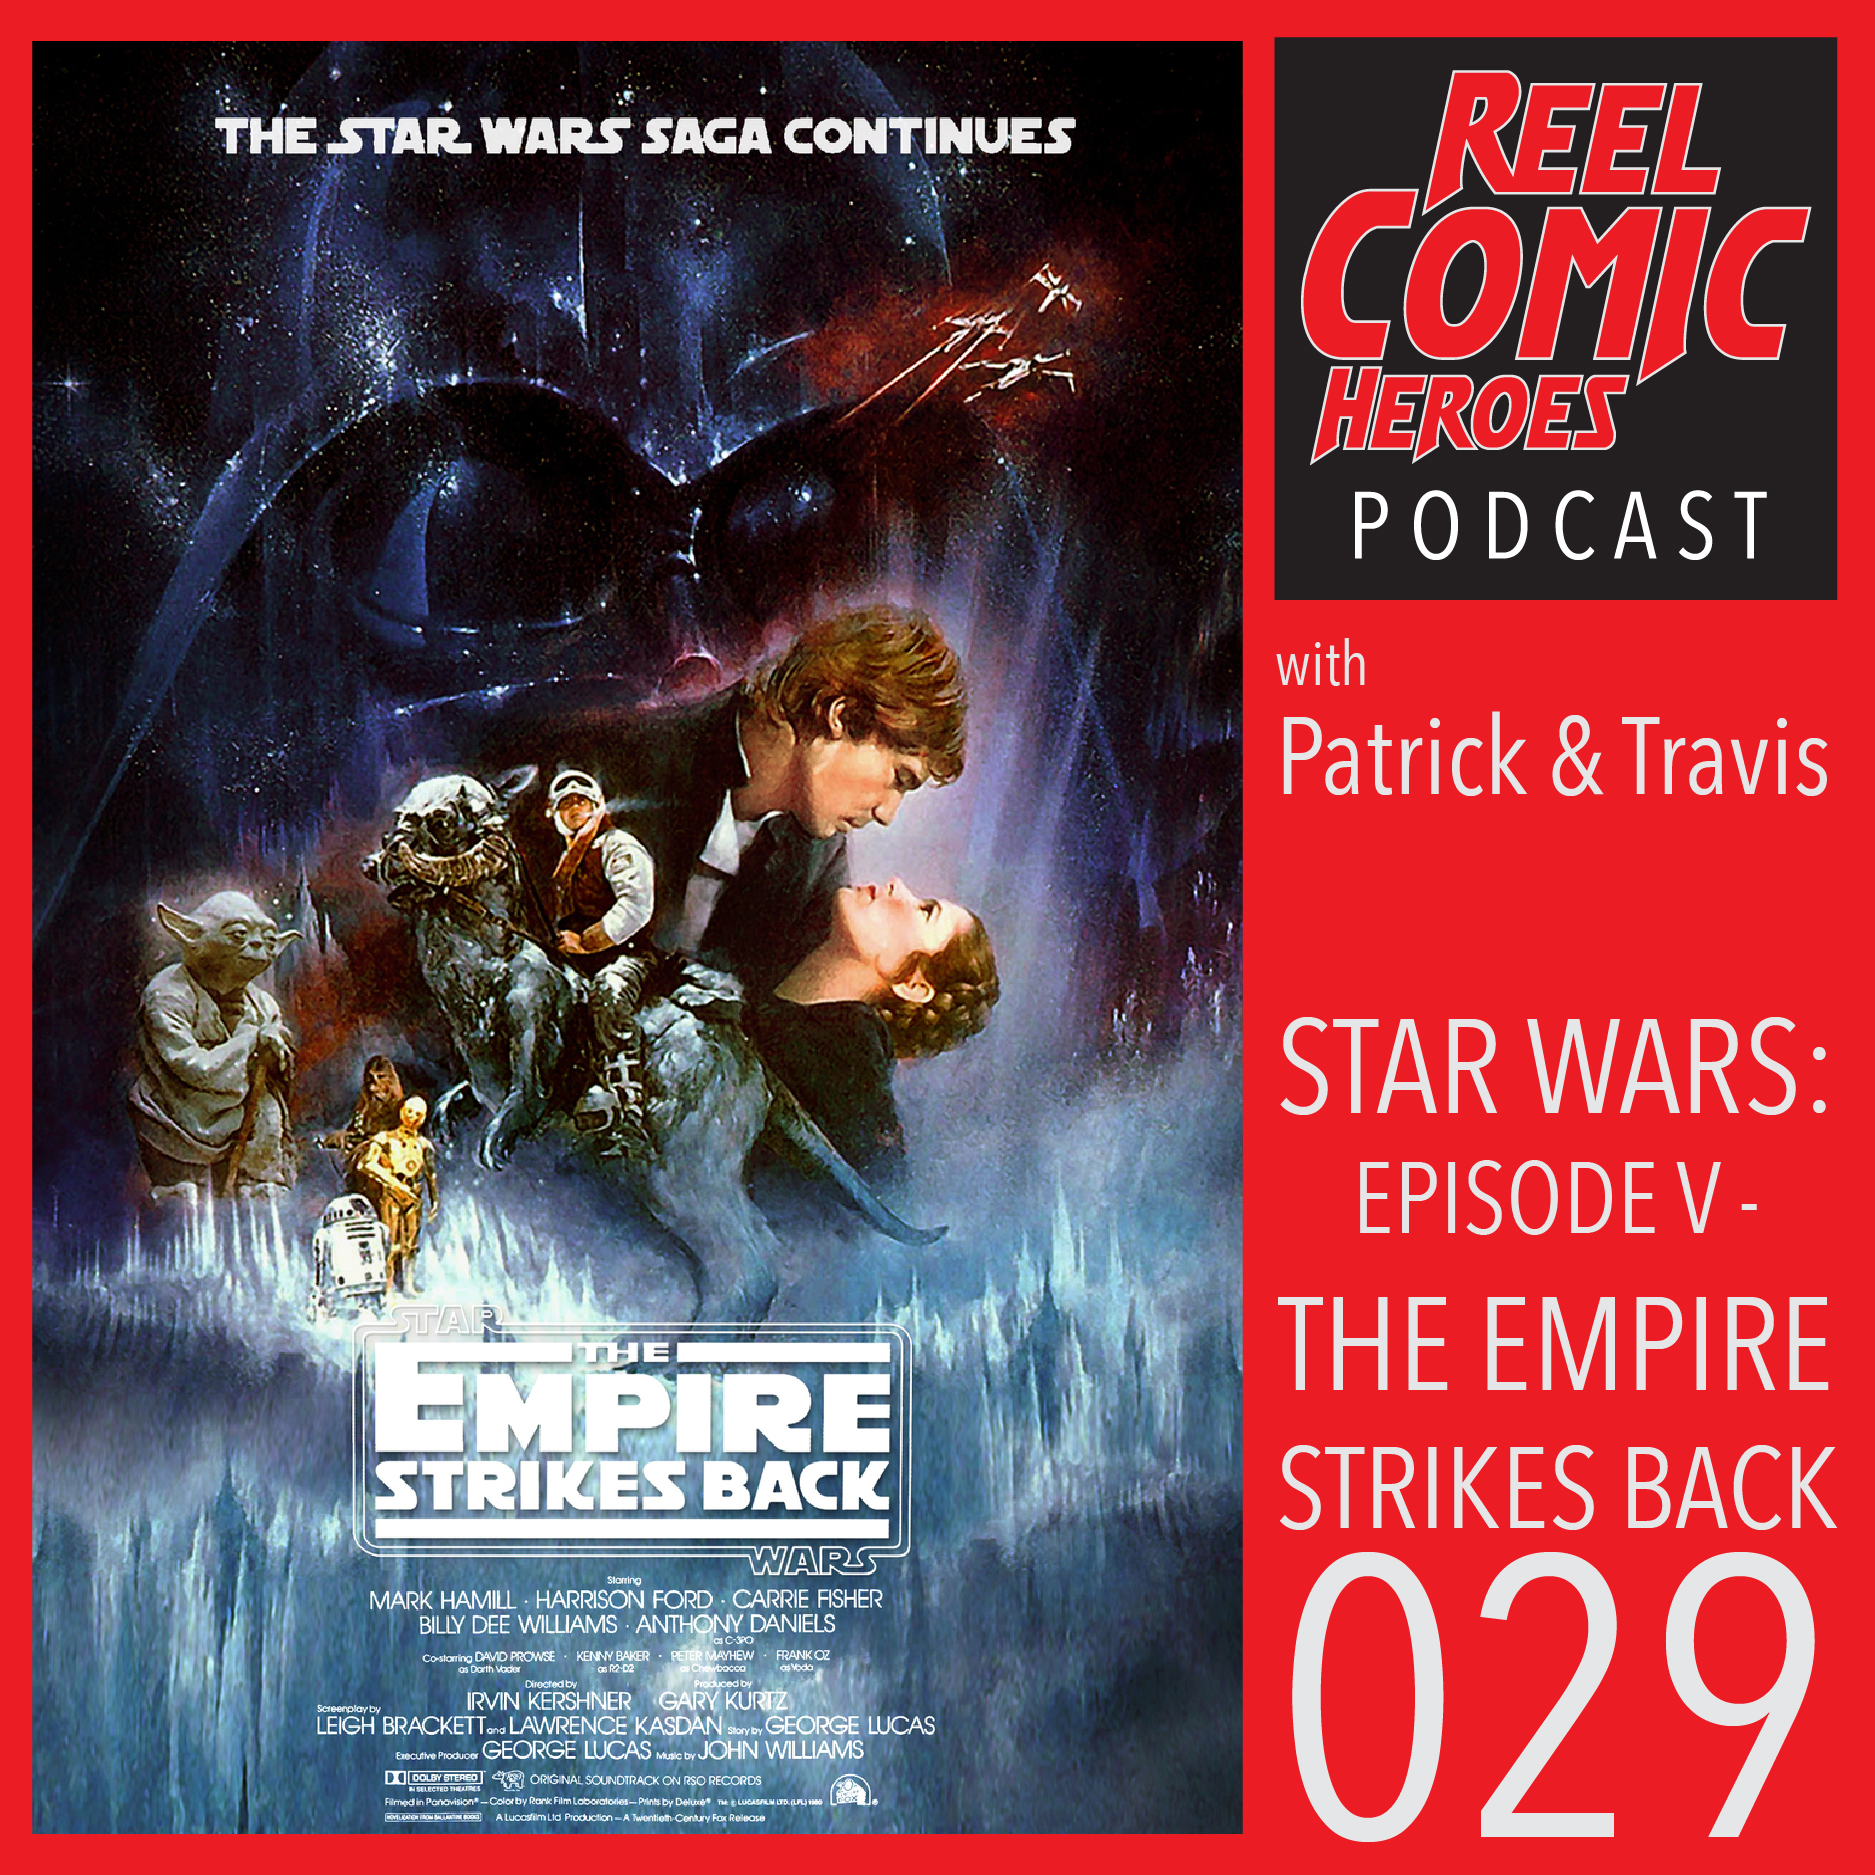 Artwork for Reel Comic Heroes 029 - Star Wars: Episode V - The Empire Strikes Back